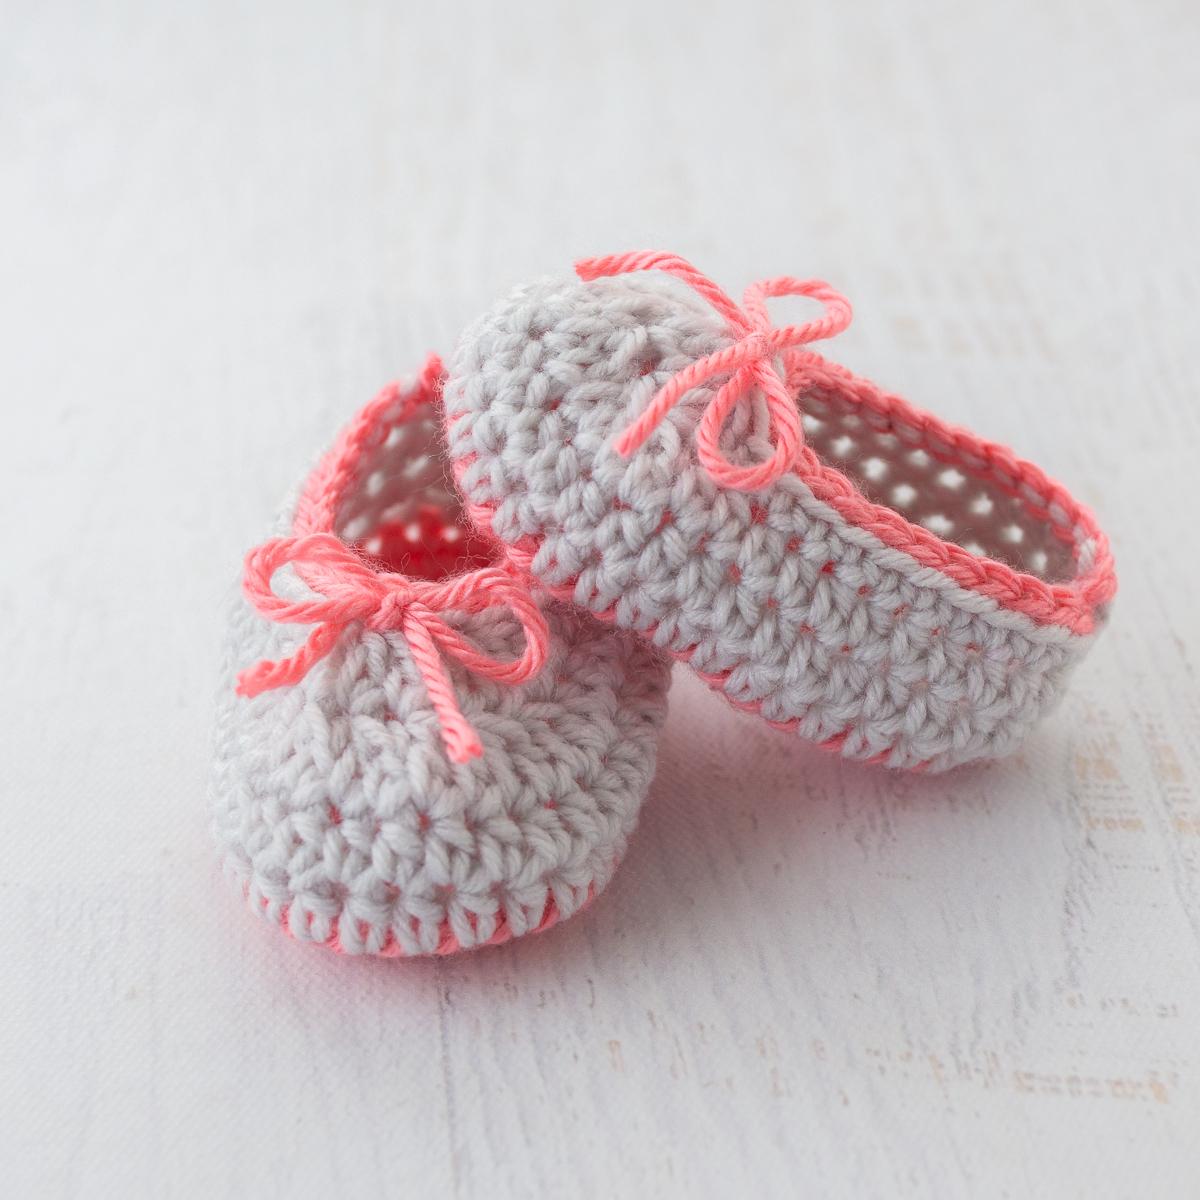 Neon Trim Baby Slippers Free Crochet Pattern